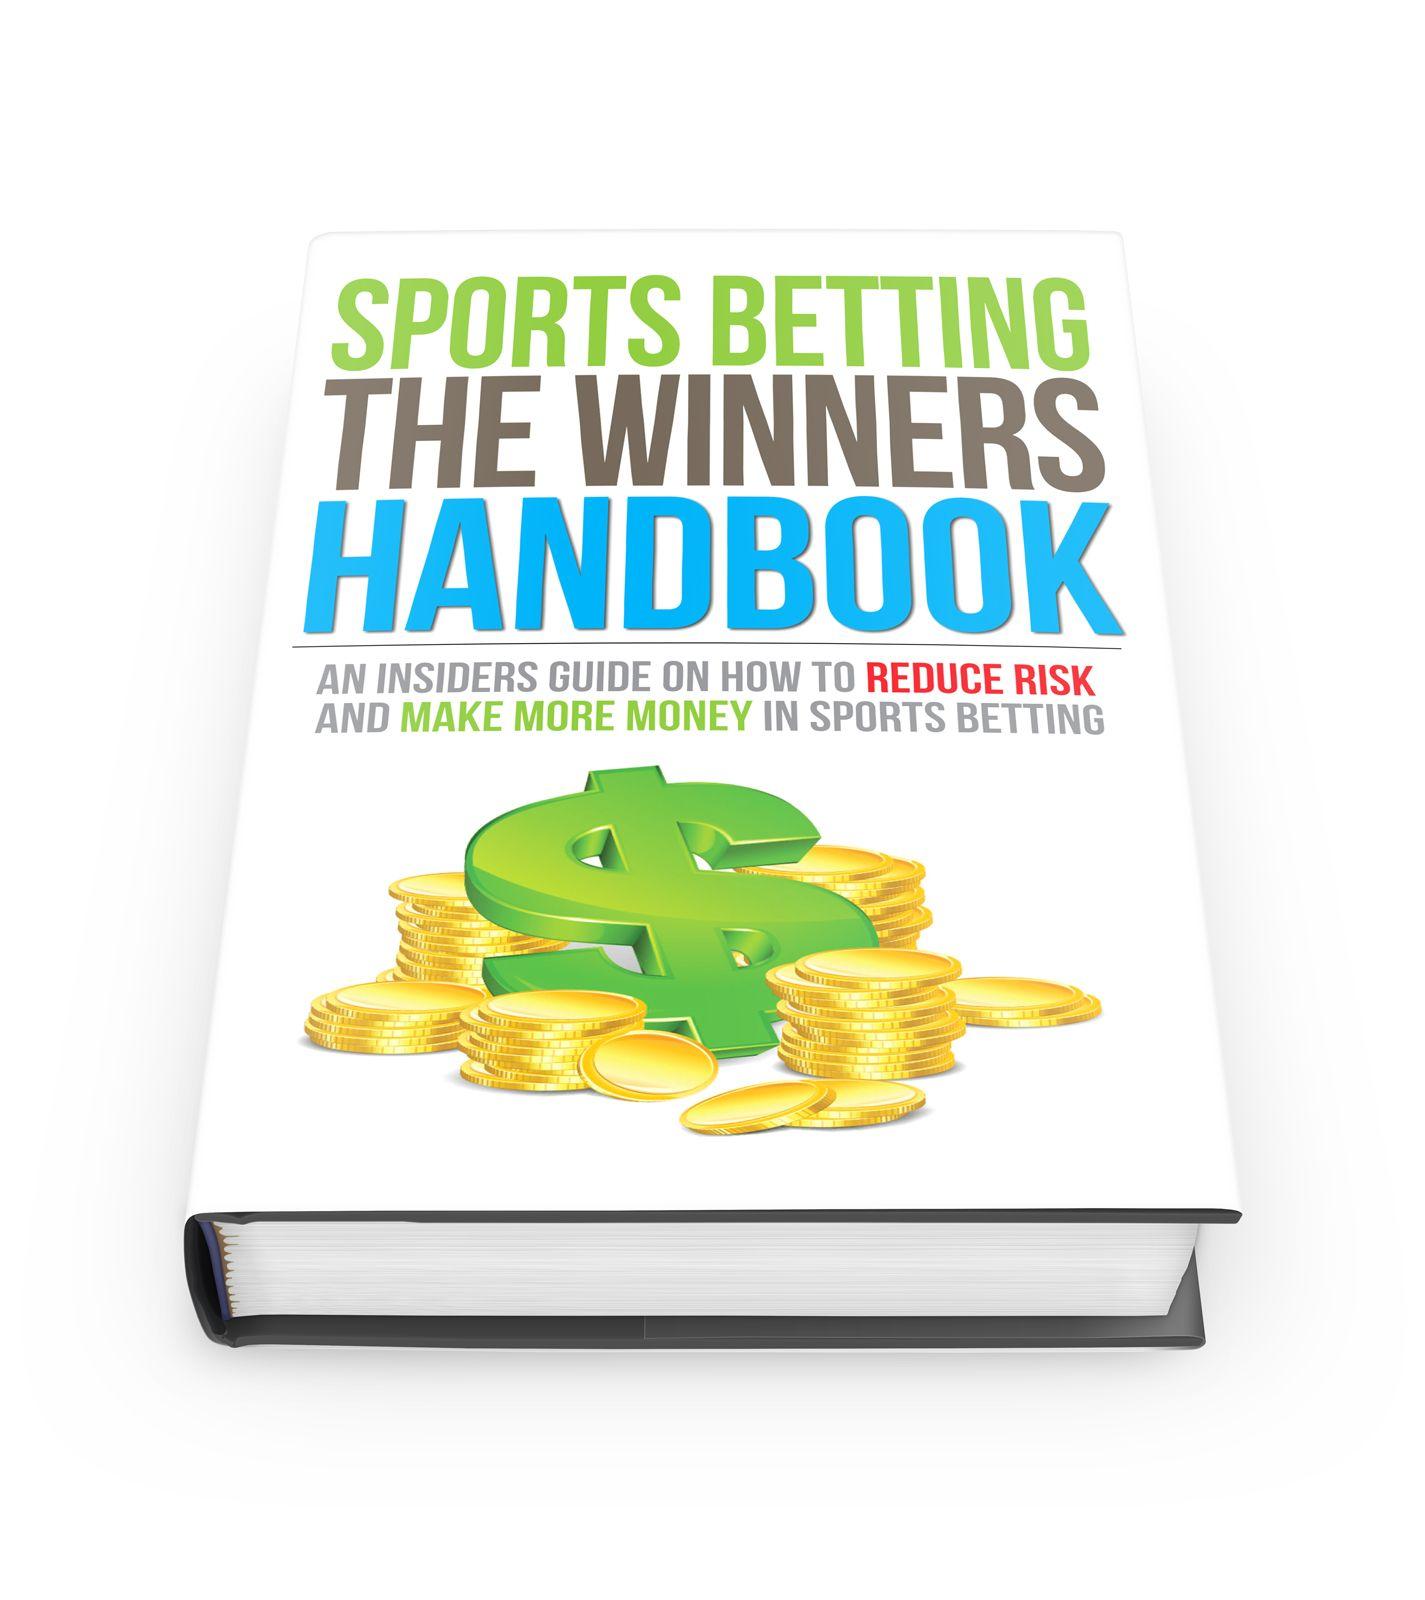 Books sports betting bwin soccer betting odds